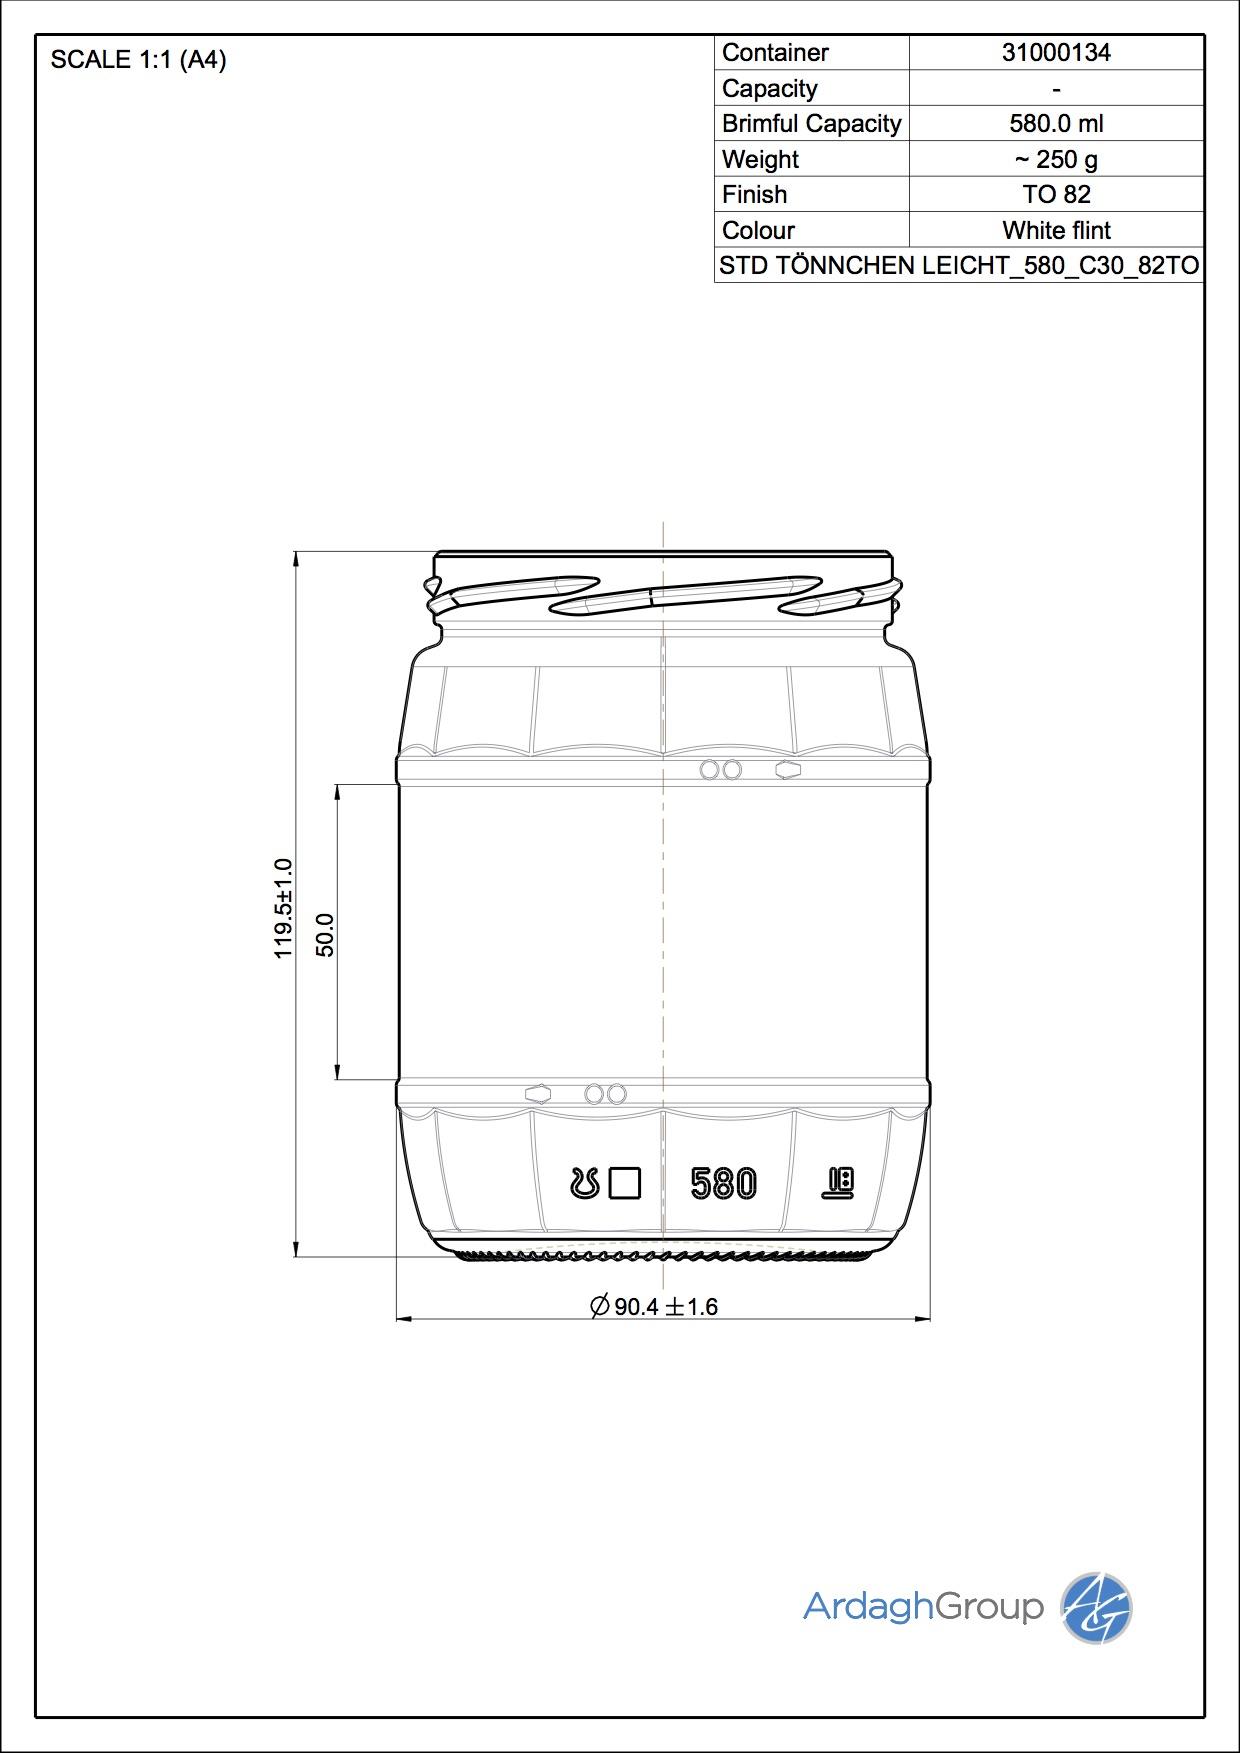 580ml Verpackungsglsd Tönnchen